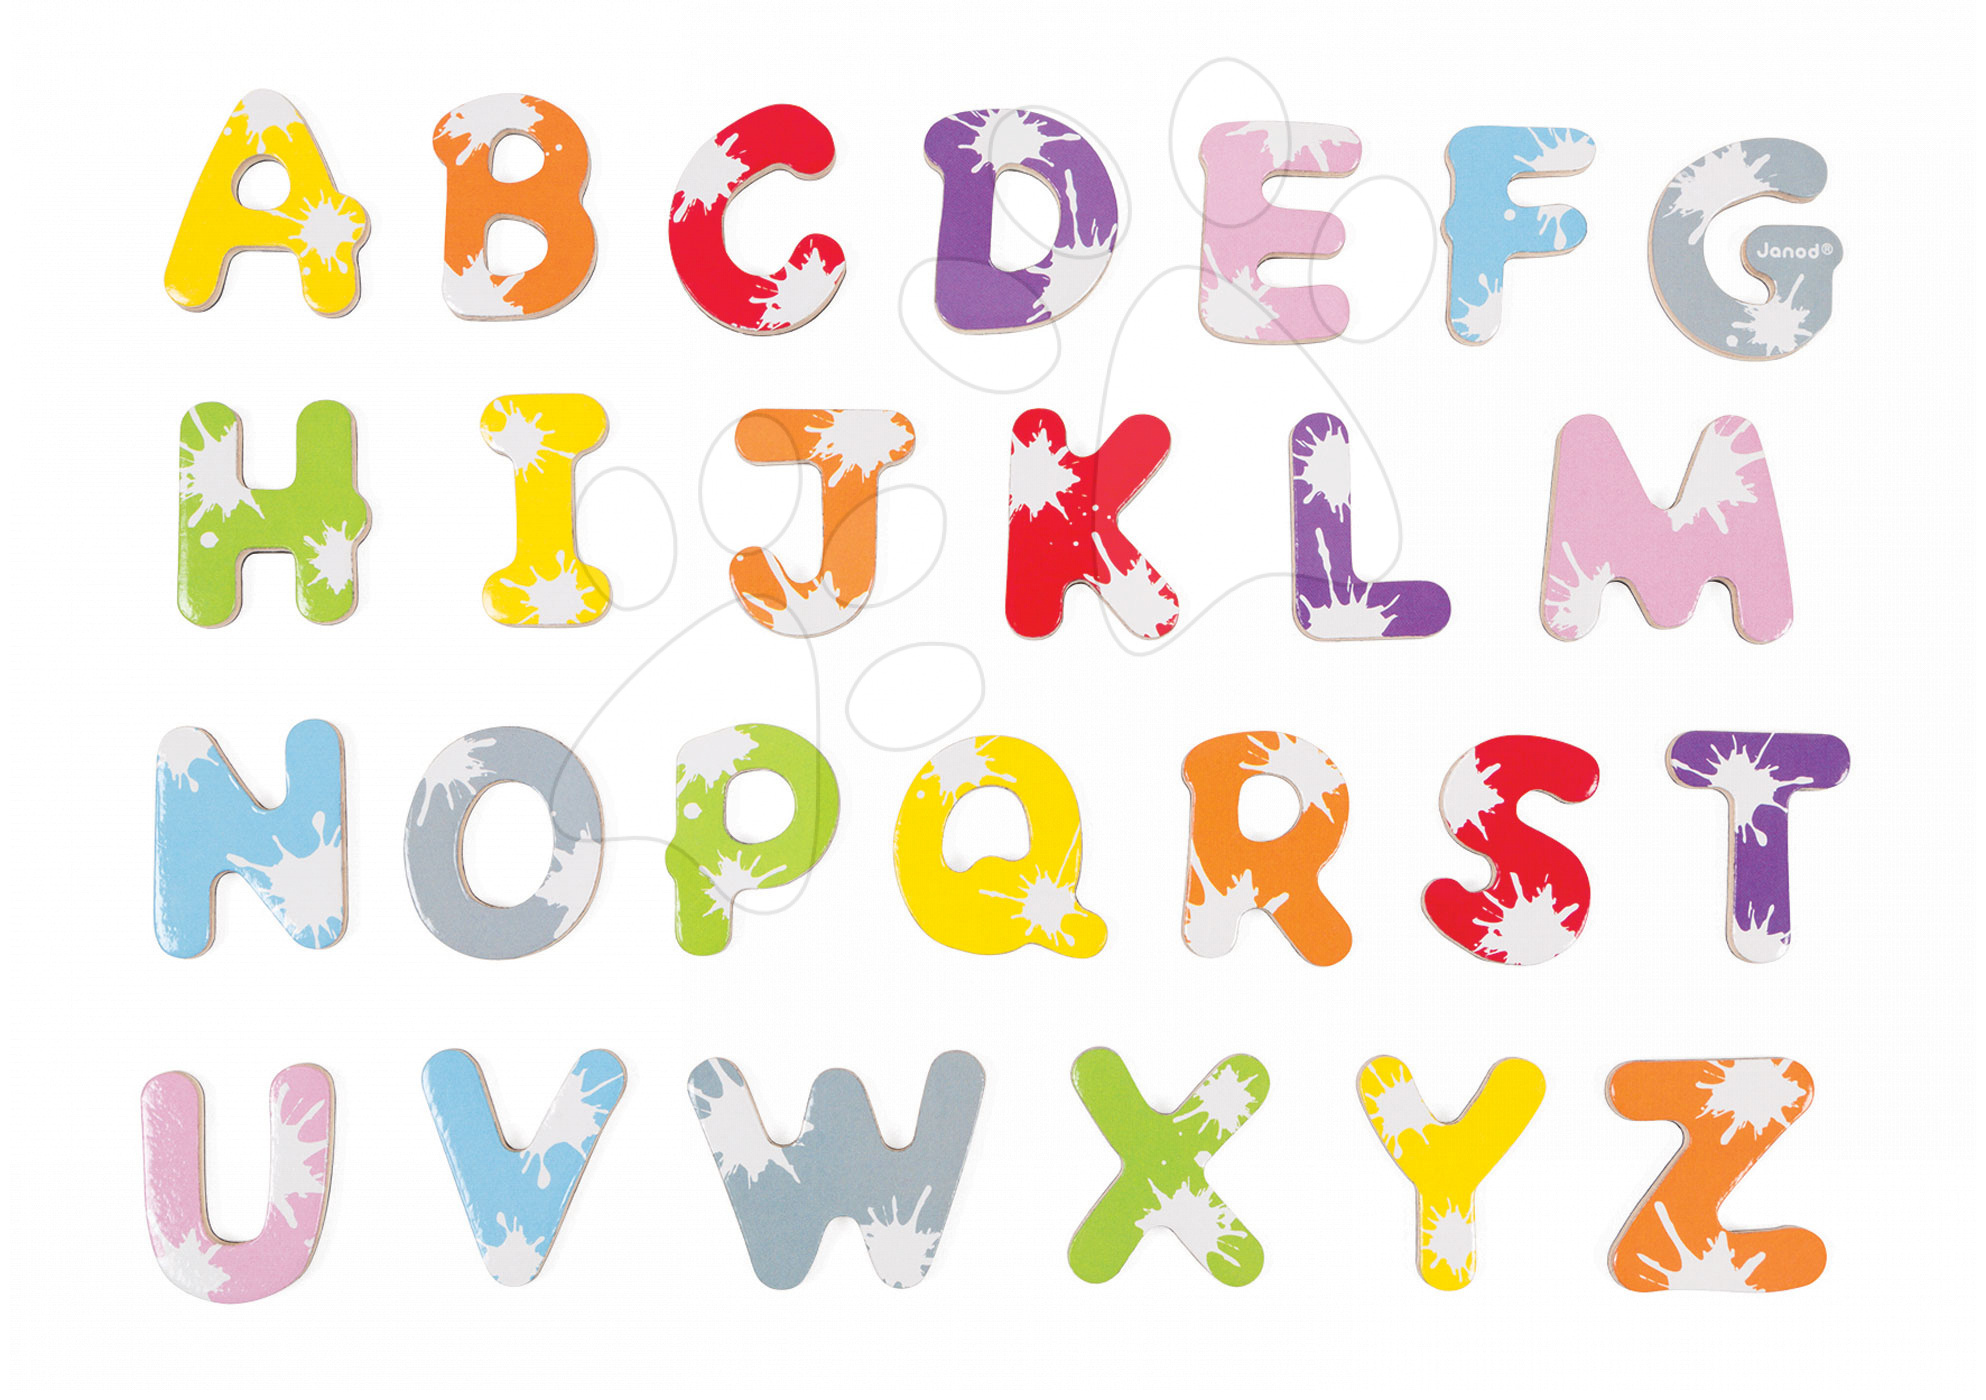 Magnetky pre deti - Drevené magnetky abeceda Splash Janod od 3 rokov